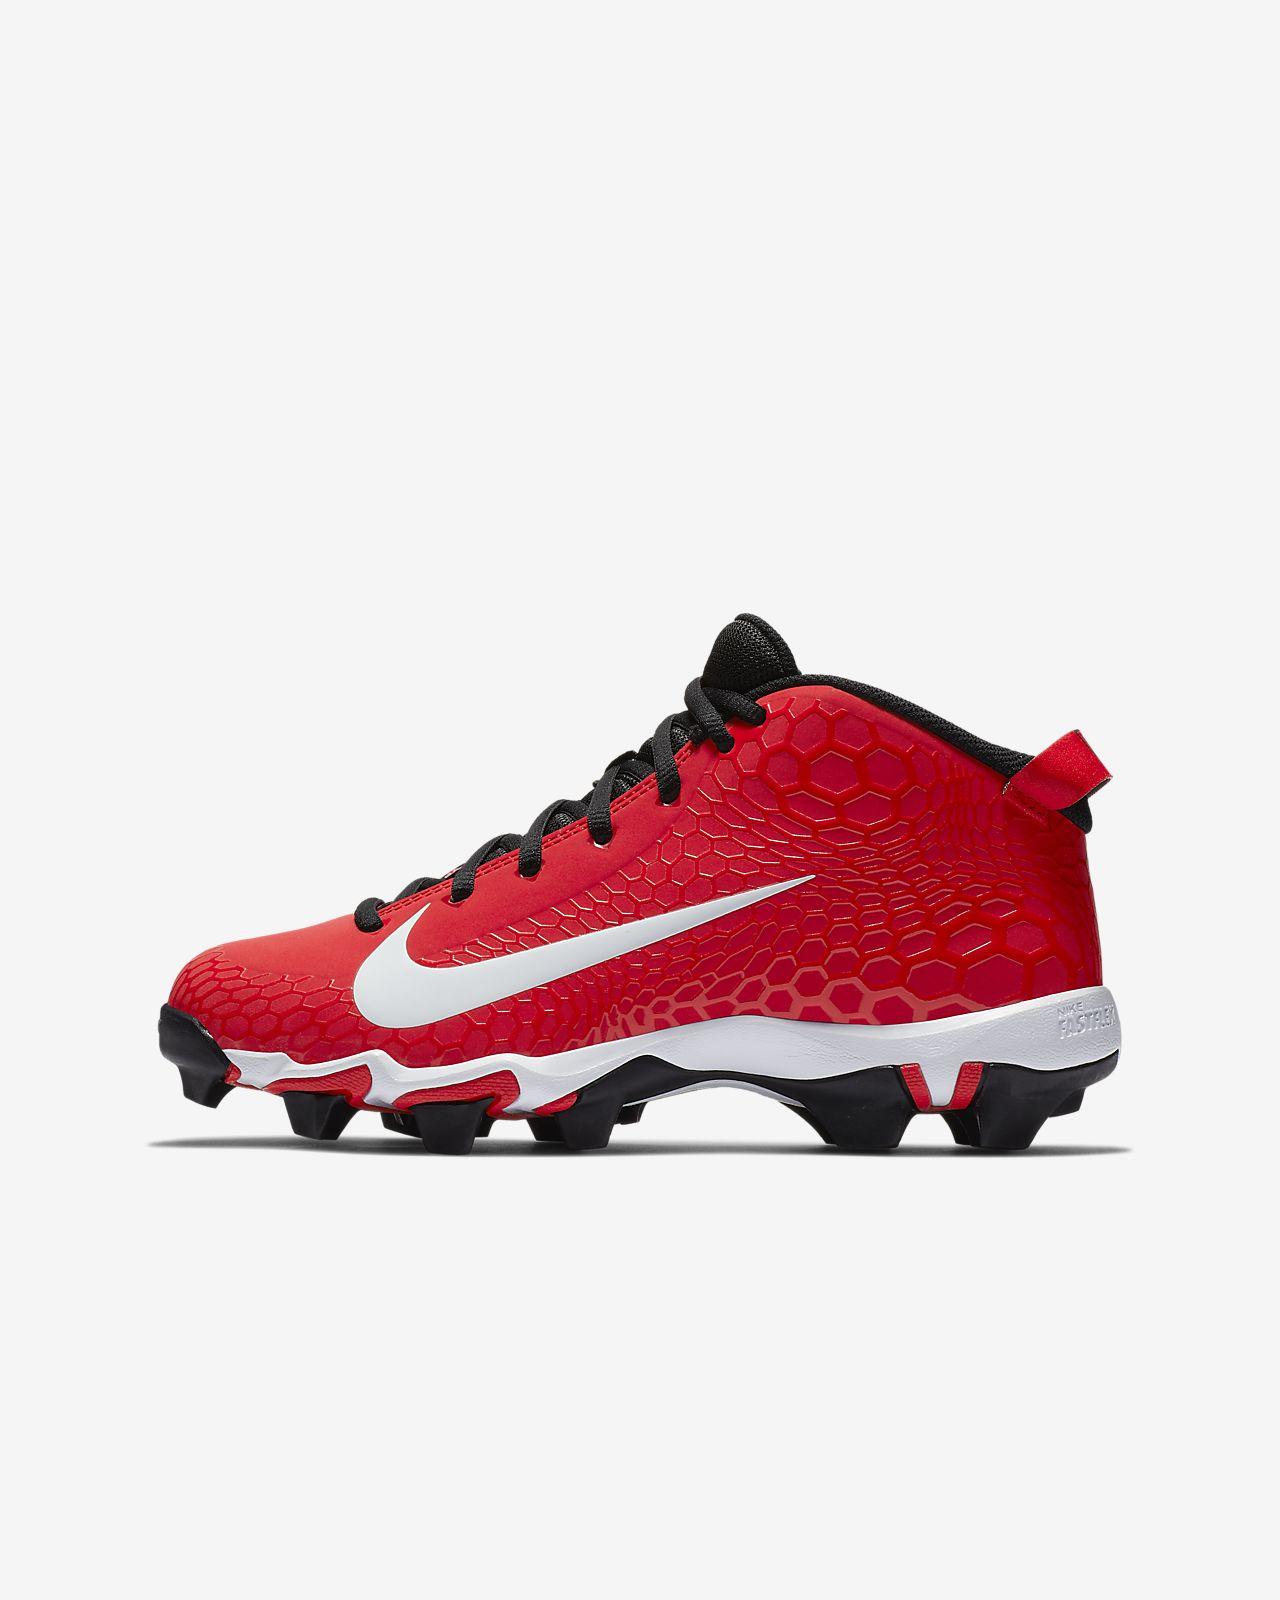 Nike Force Trout 5 Pro Keystone Little/Big Kids' Baseball Cleat